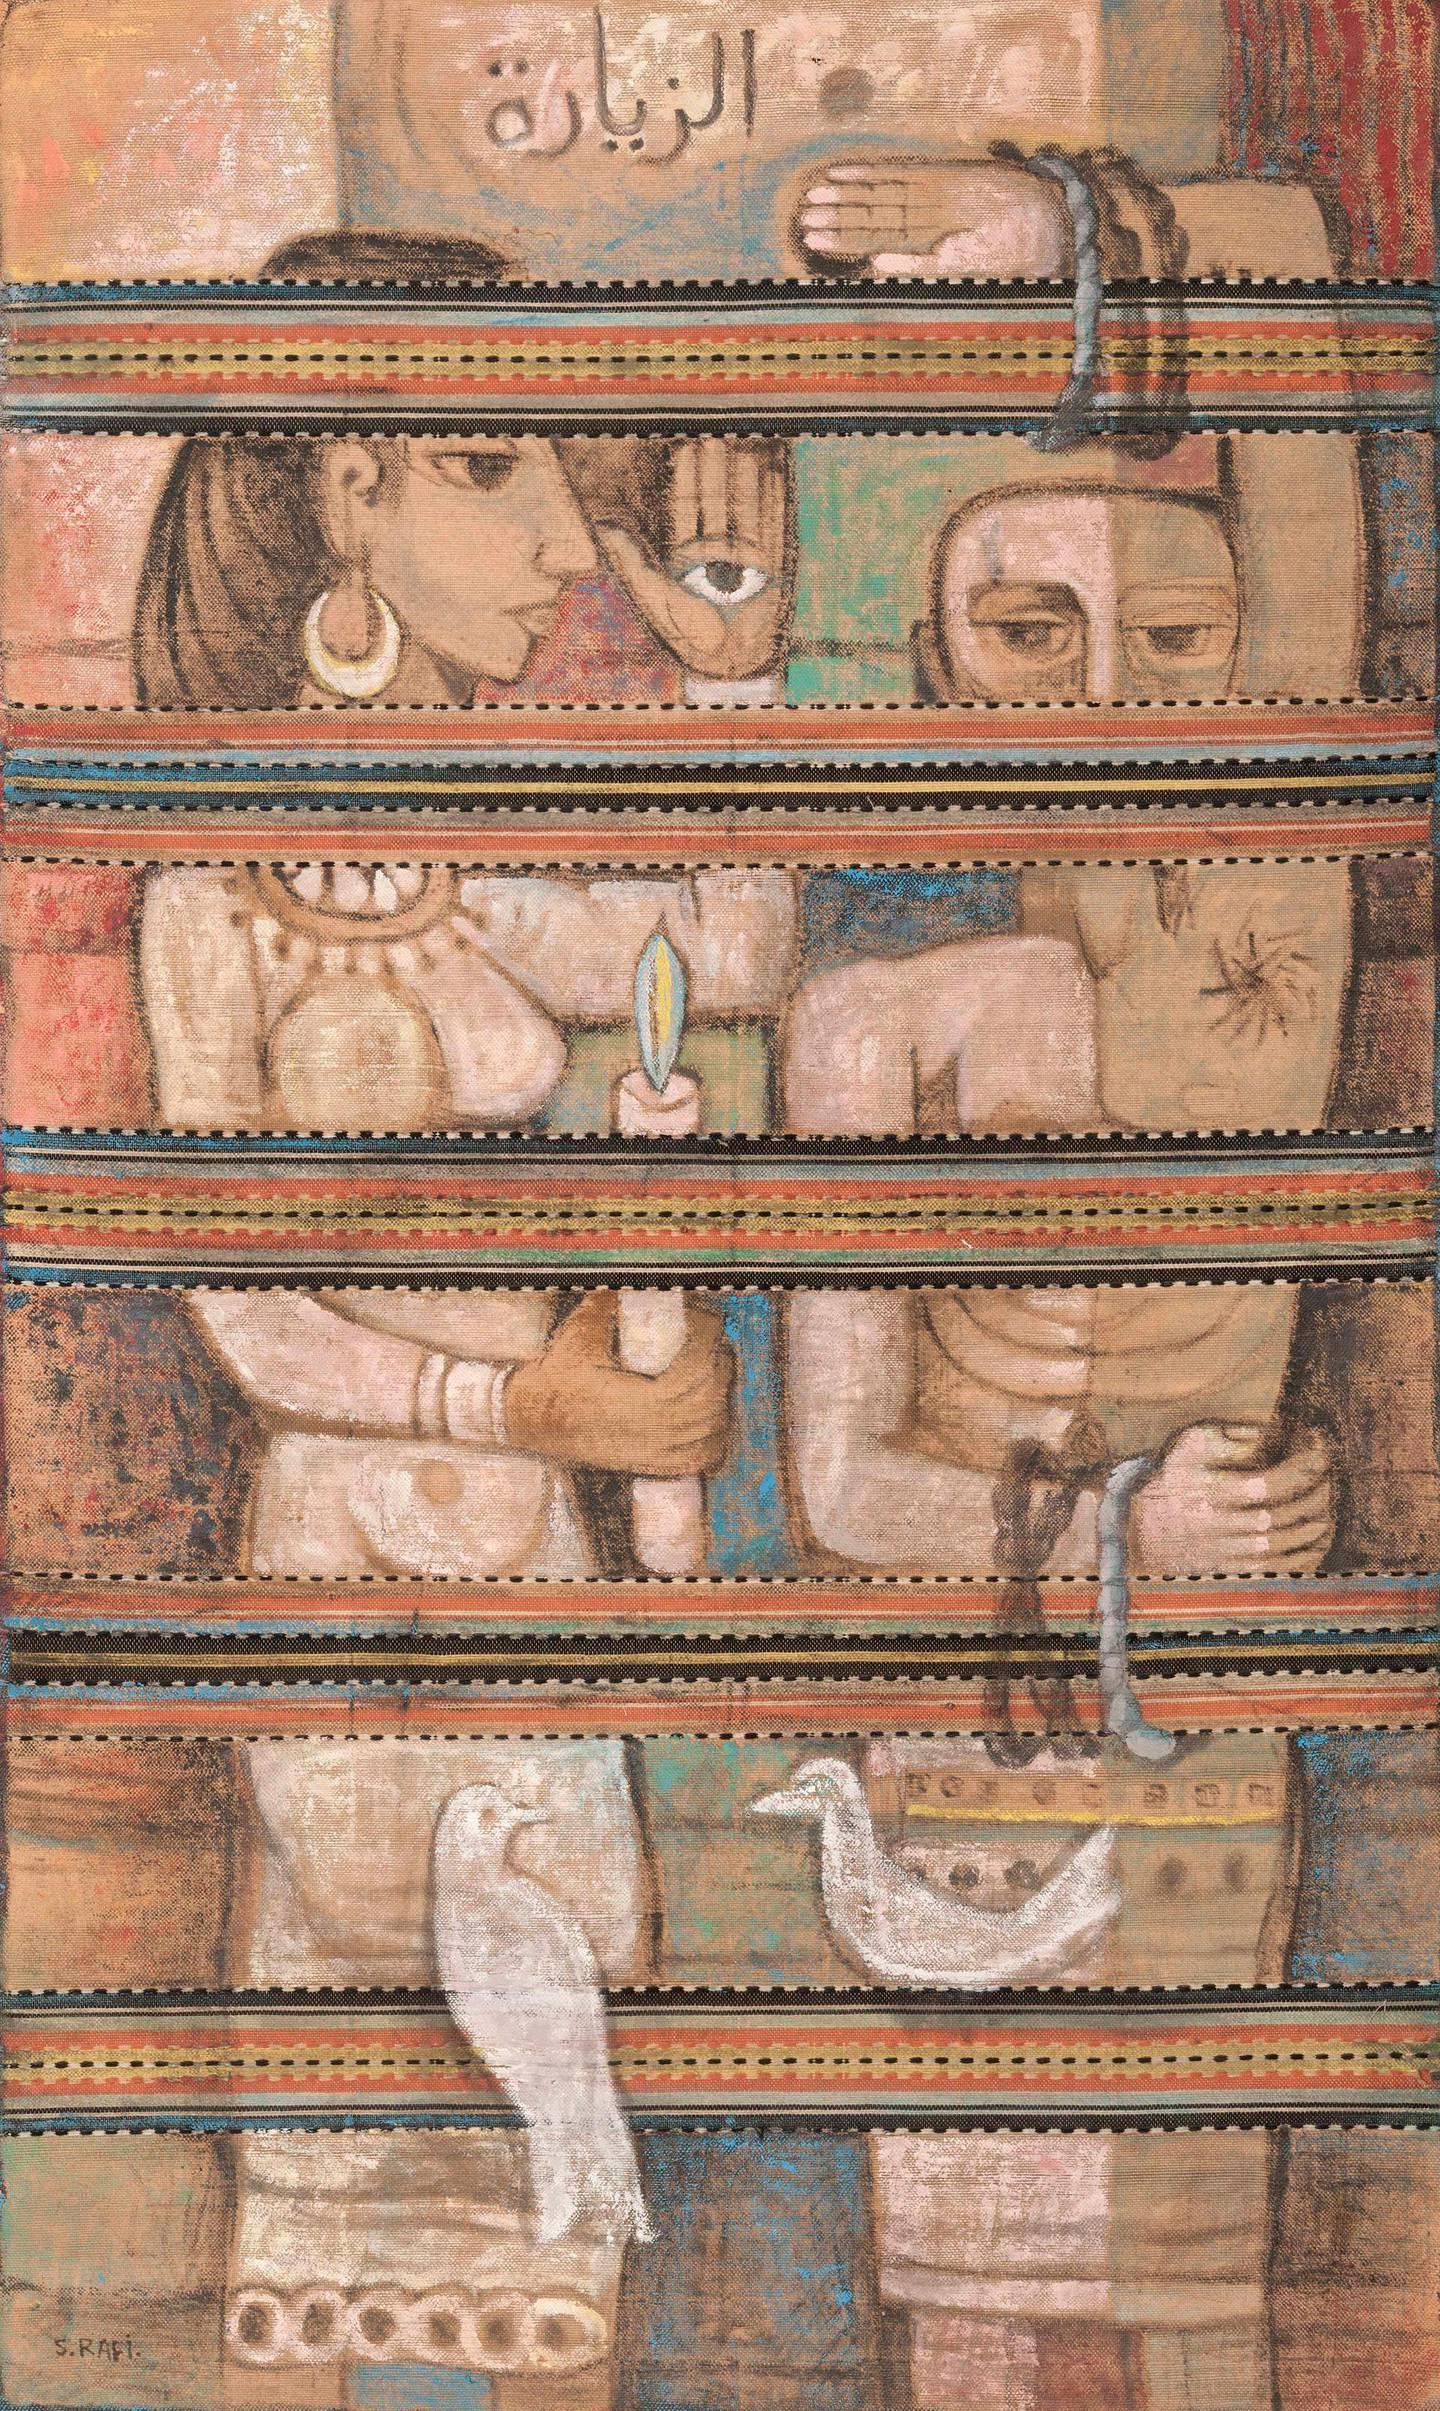 SR014_LR_Samir Rafi, The Visit, 1965, Oil on rug,220x133cm, Image courtesy of Ubuntu Art Gallery